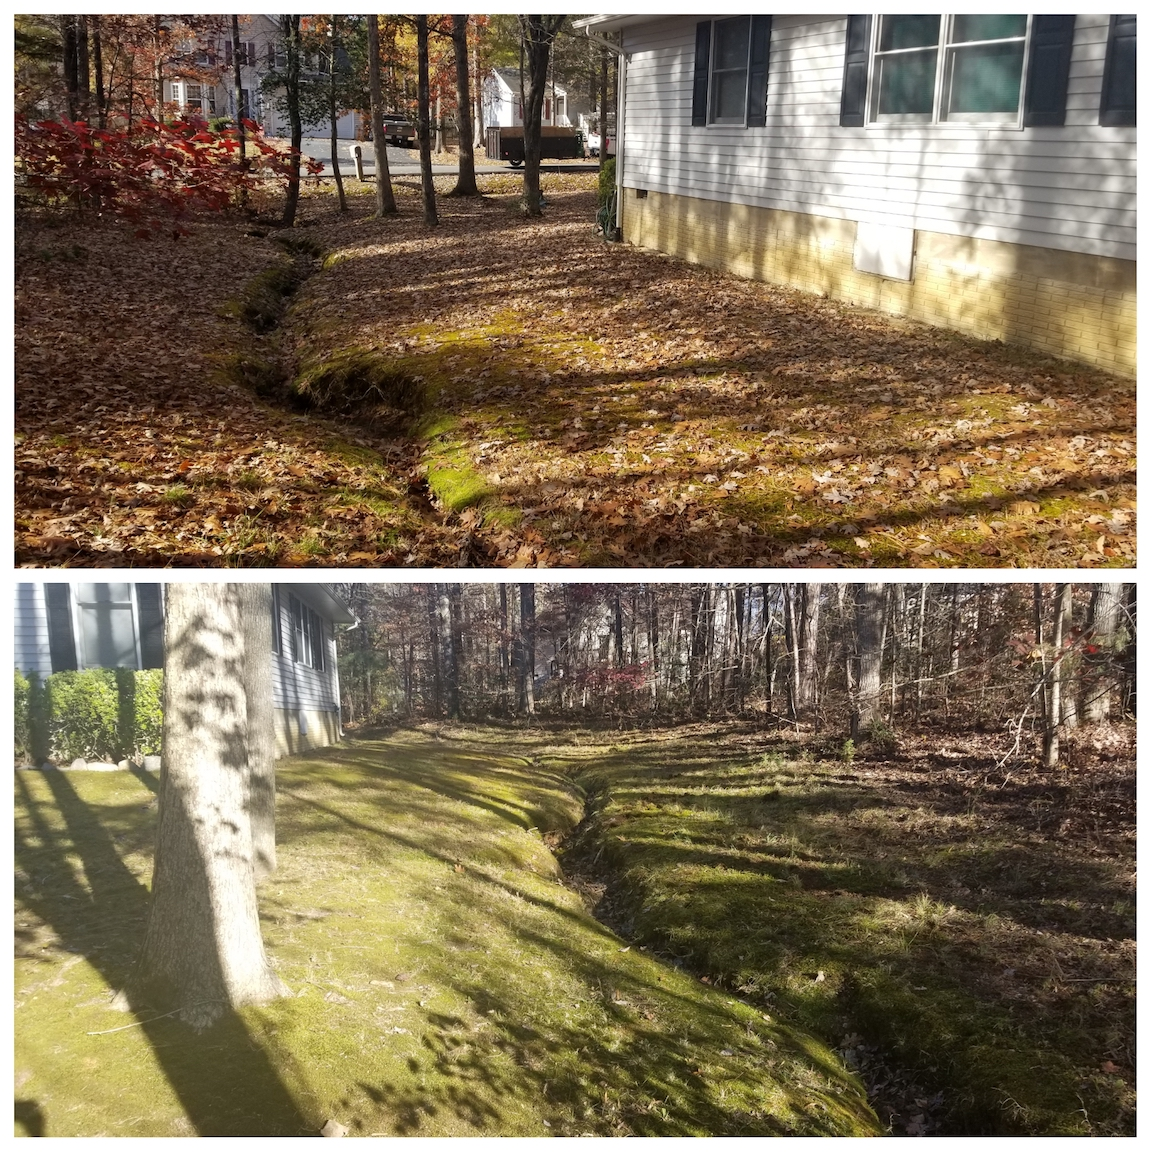 Leaf Cleanup, Leaf Pickup, Leaf Vacuuming, Haul Leaves, Fall Cleanup, Winter Cleanup